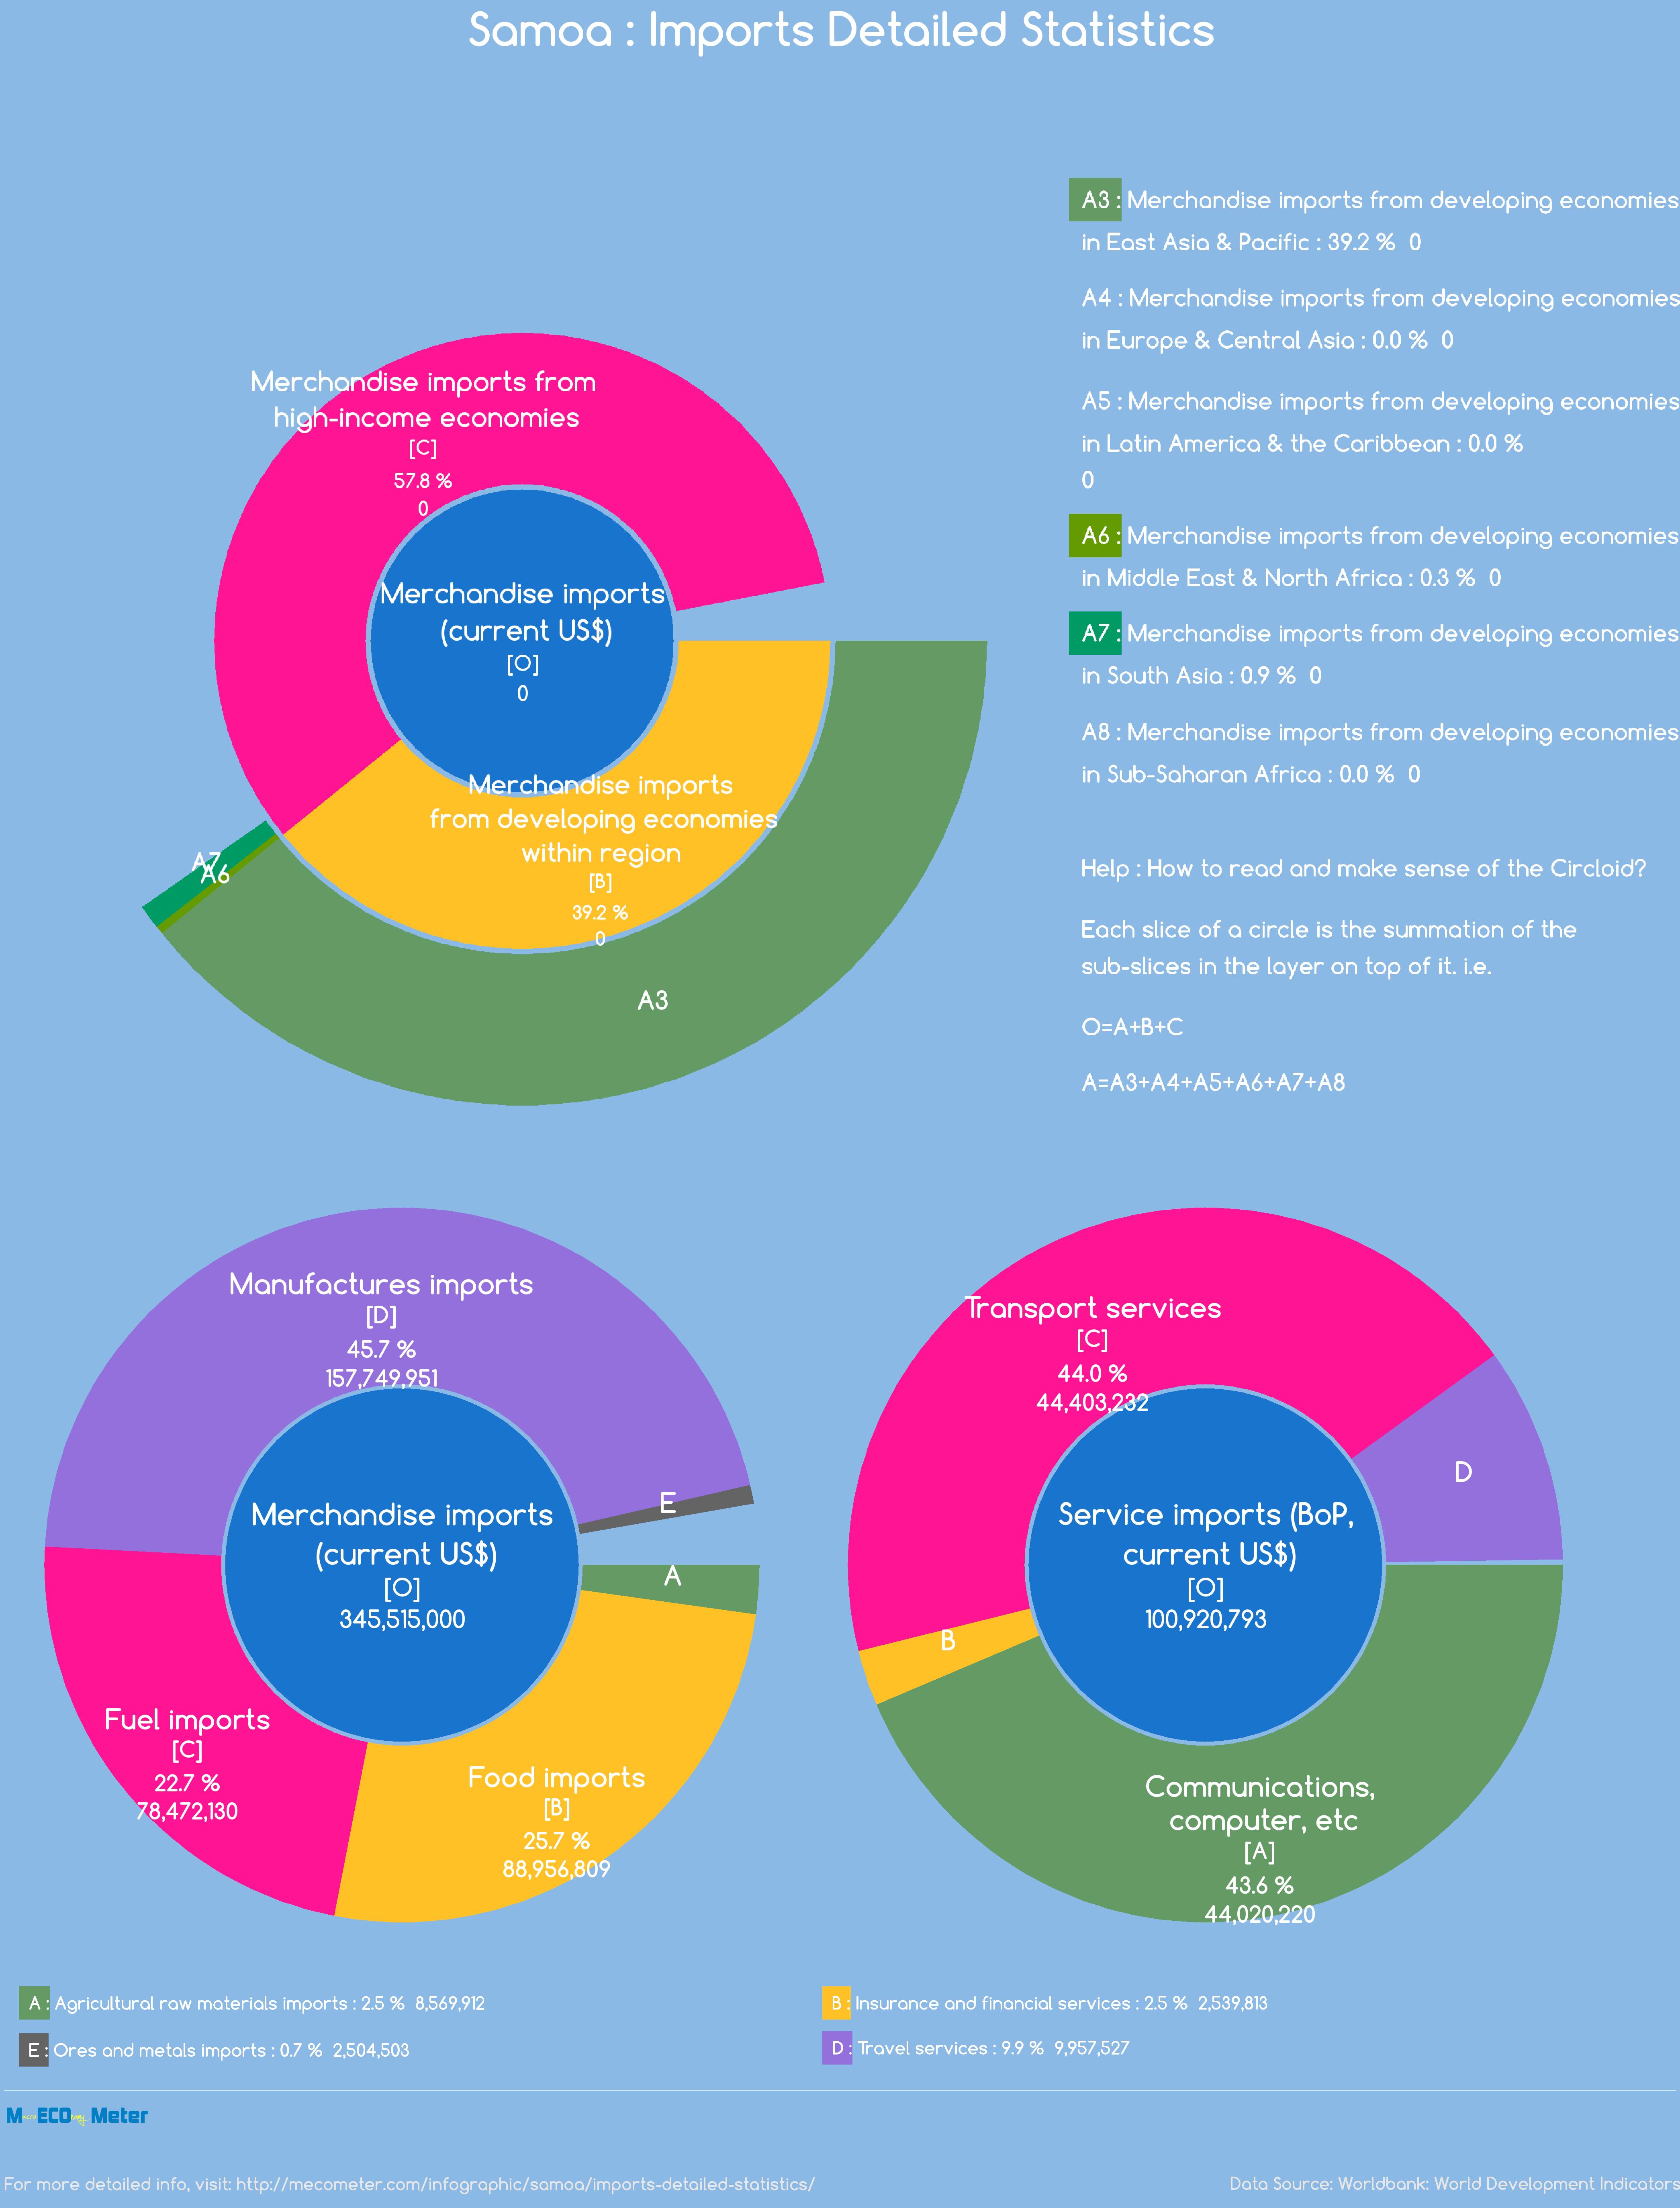 Samoa : Imports Detailed Statistics